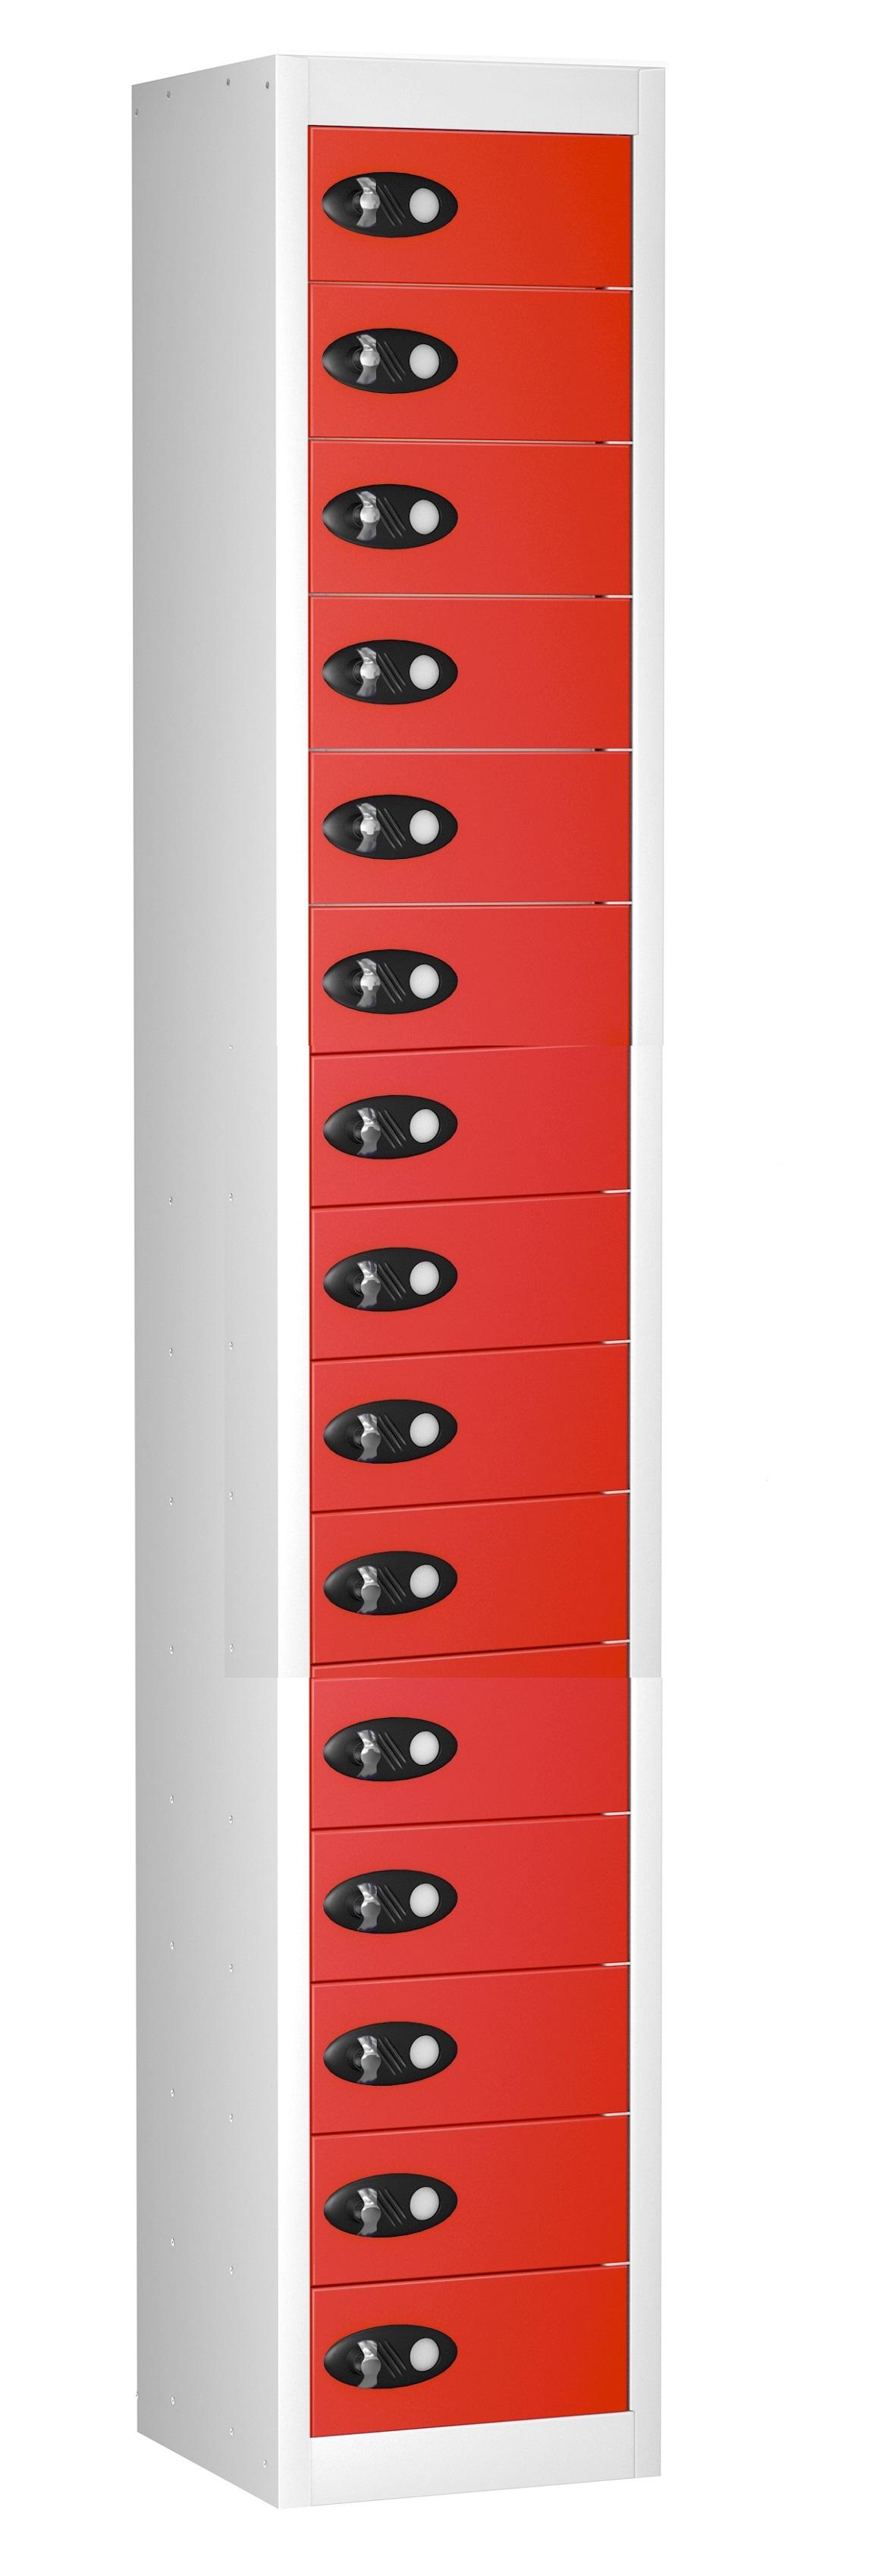 Mobile Phone Storage Locker -15 Doors (Non Charging)